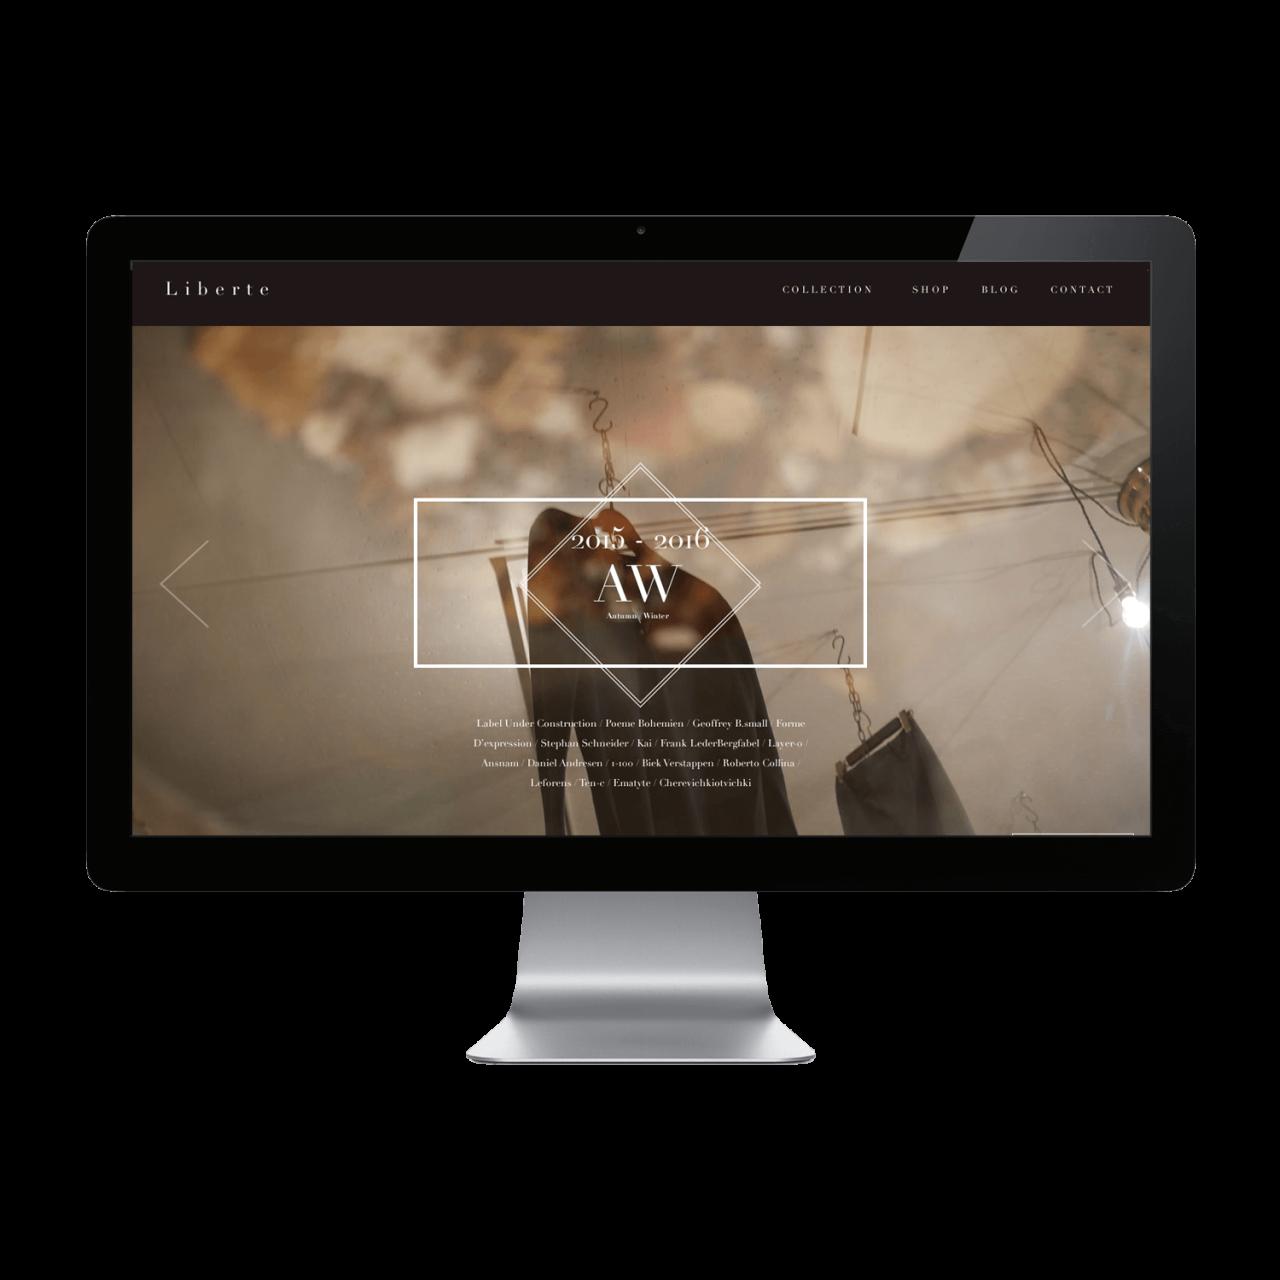 liberte-iMac2